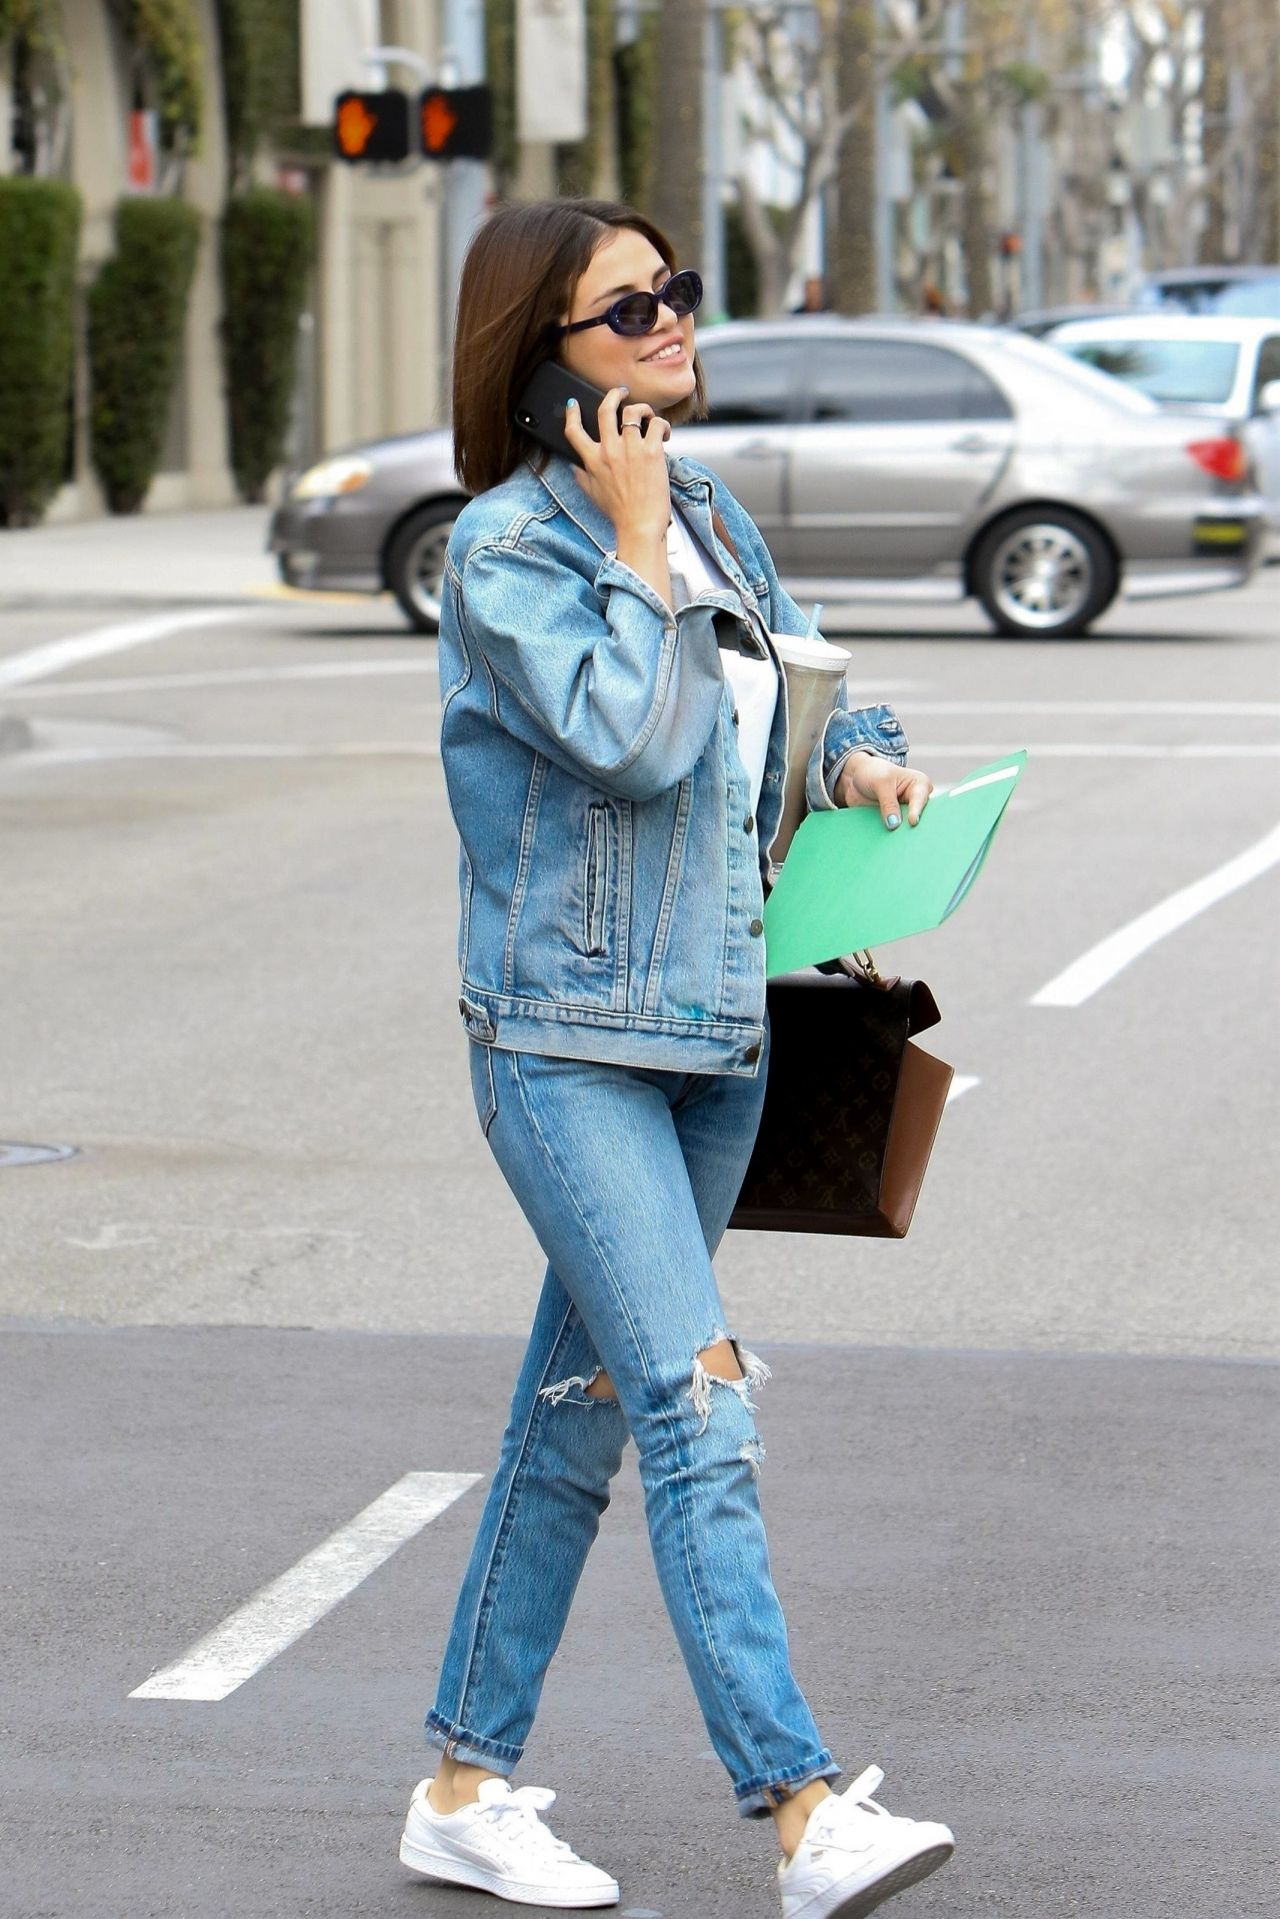 Selena Gomez Denim On Denim Look Beverly Hills 03 17 2018